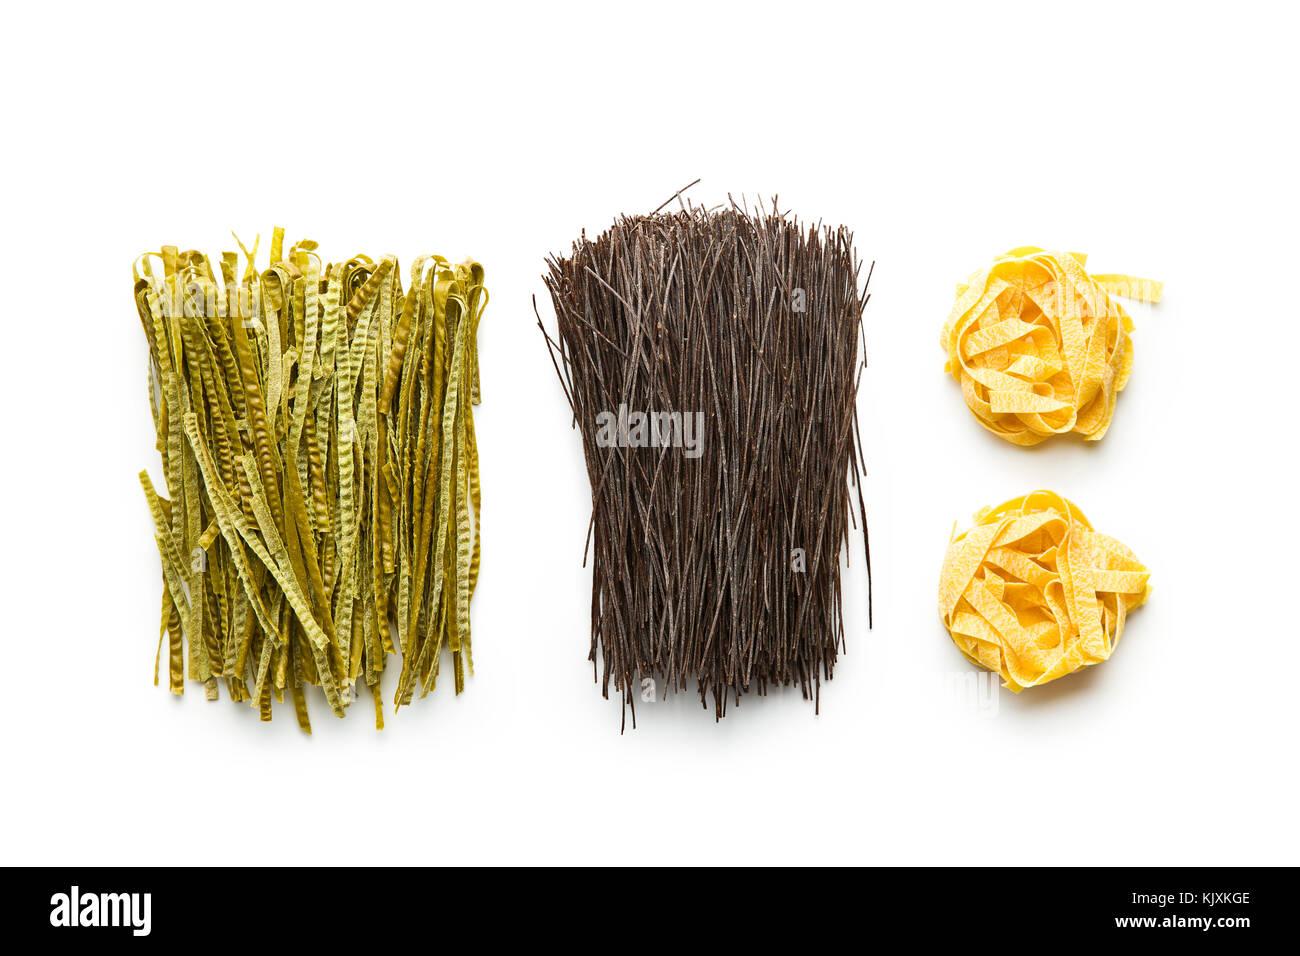 Sans gluten, riche en fibres des pâtes. haricot noir spaghetti, tagliatelle fettuccine et soja vert. Photo Stock